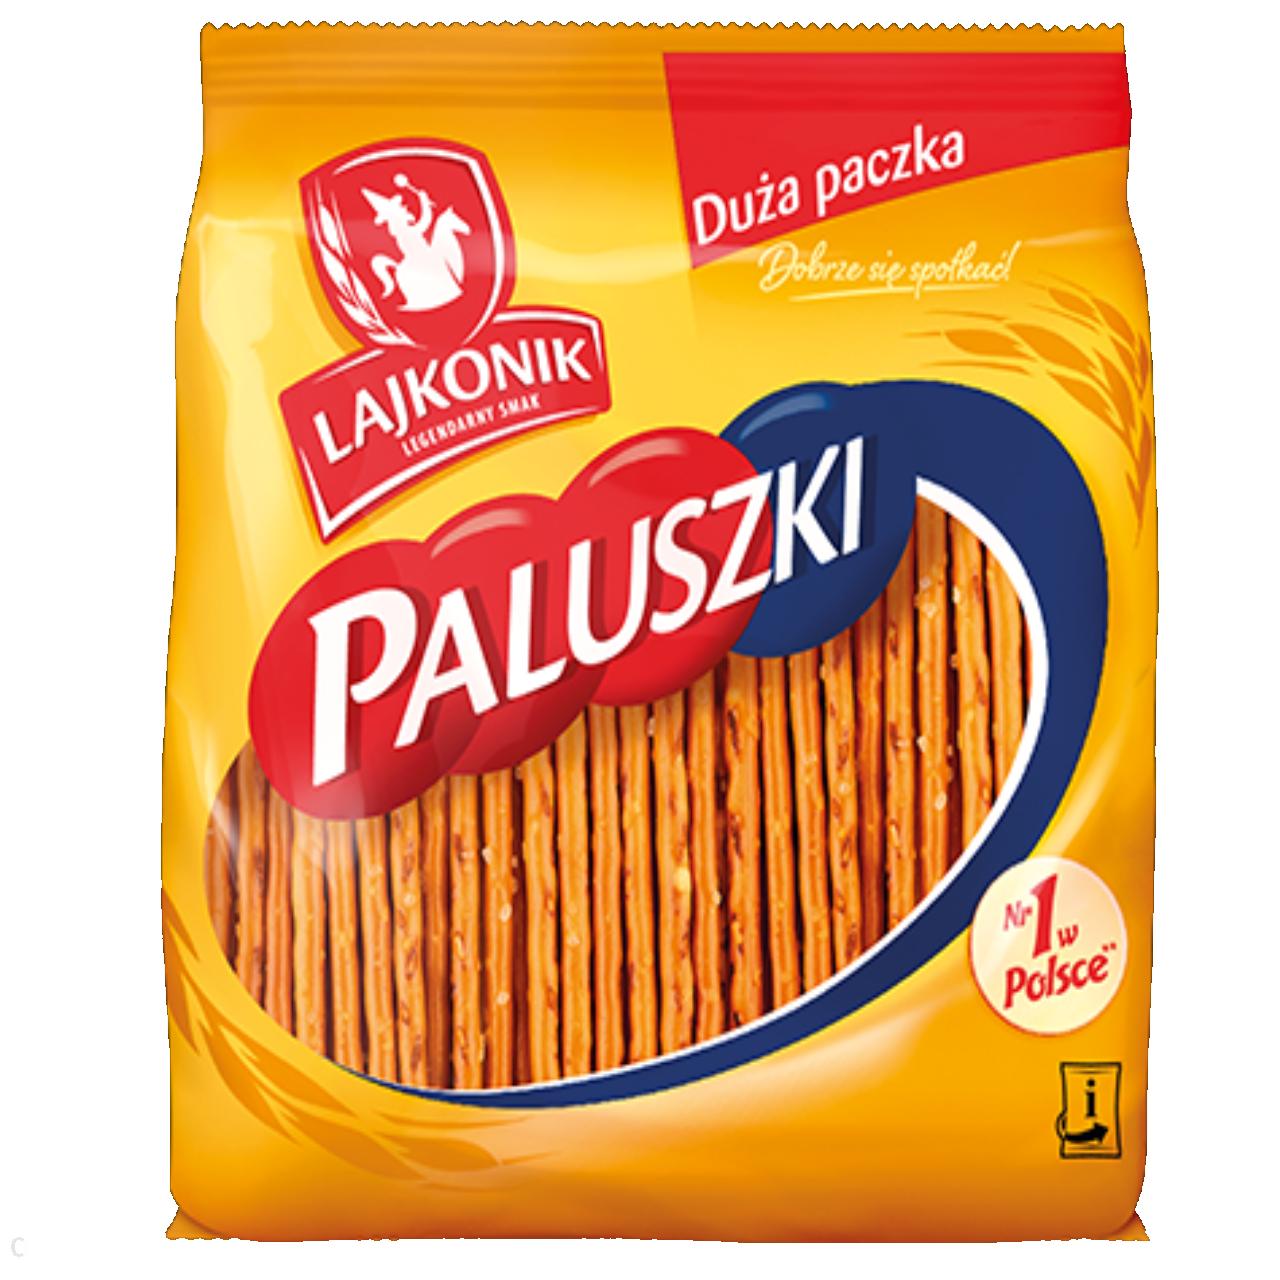 PALUSZKI SOLONE - LAJKONIK 200g